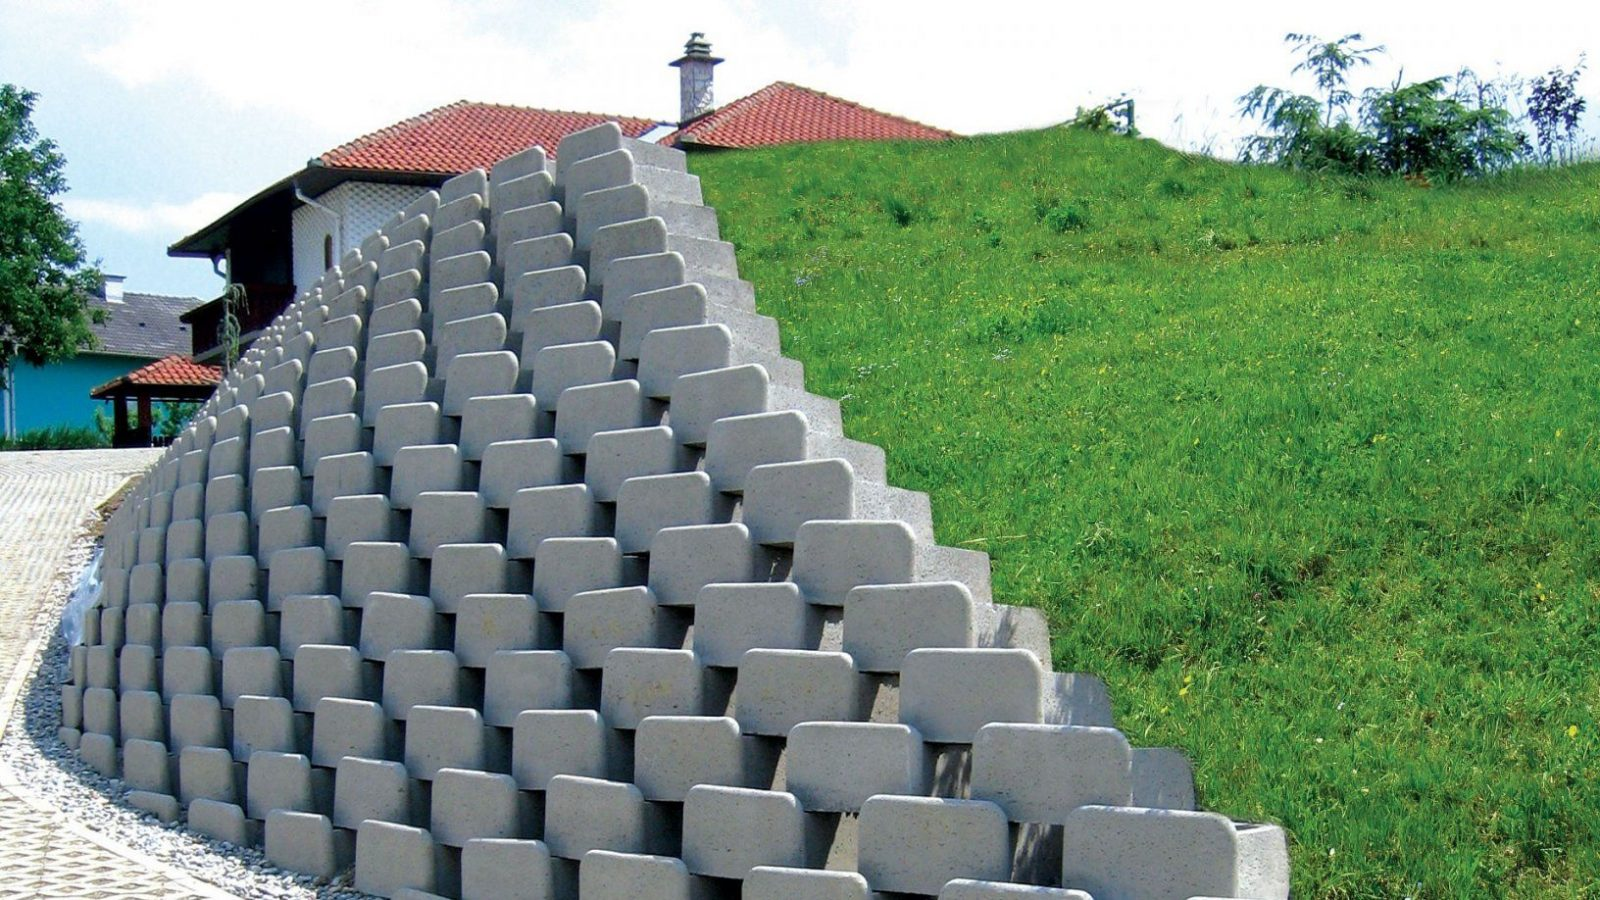 Terrasse Anlegen Hang – Siddhimind von Terrasse Am Hang Anlegen Bild